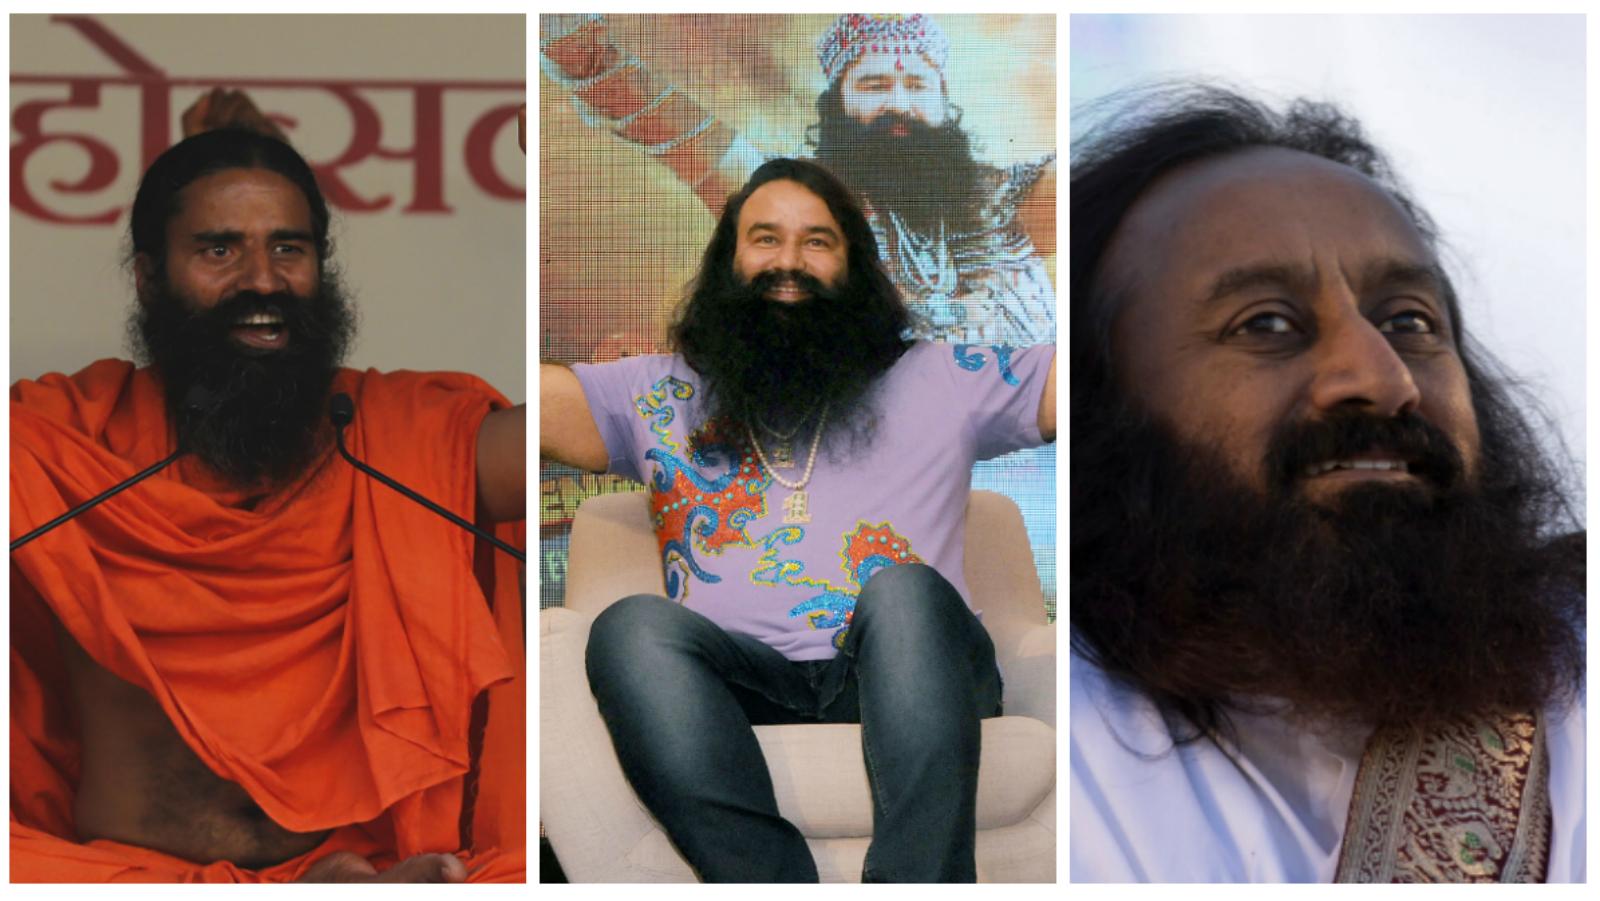 india-guru-baba-spiritual